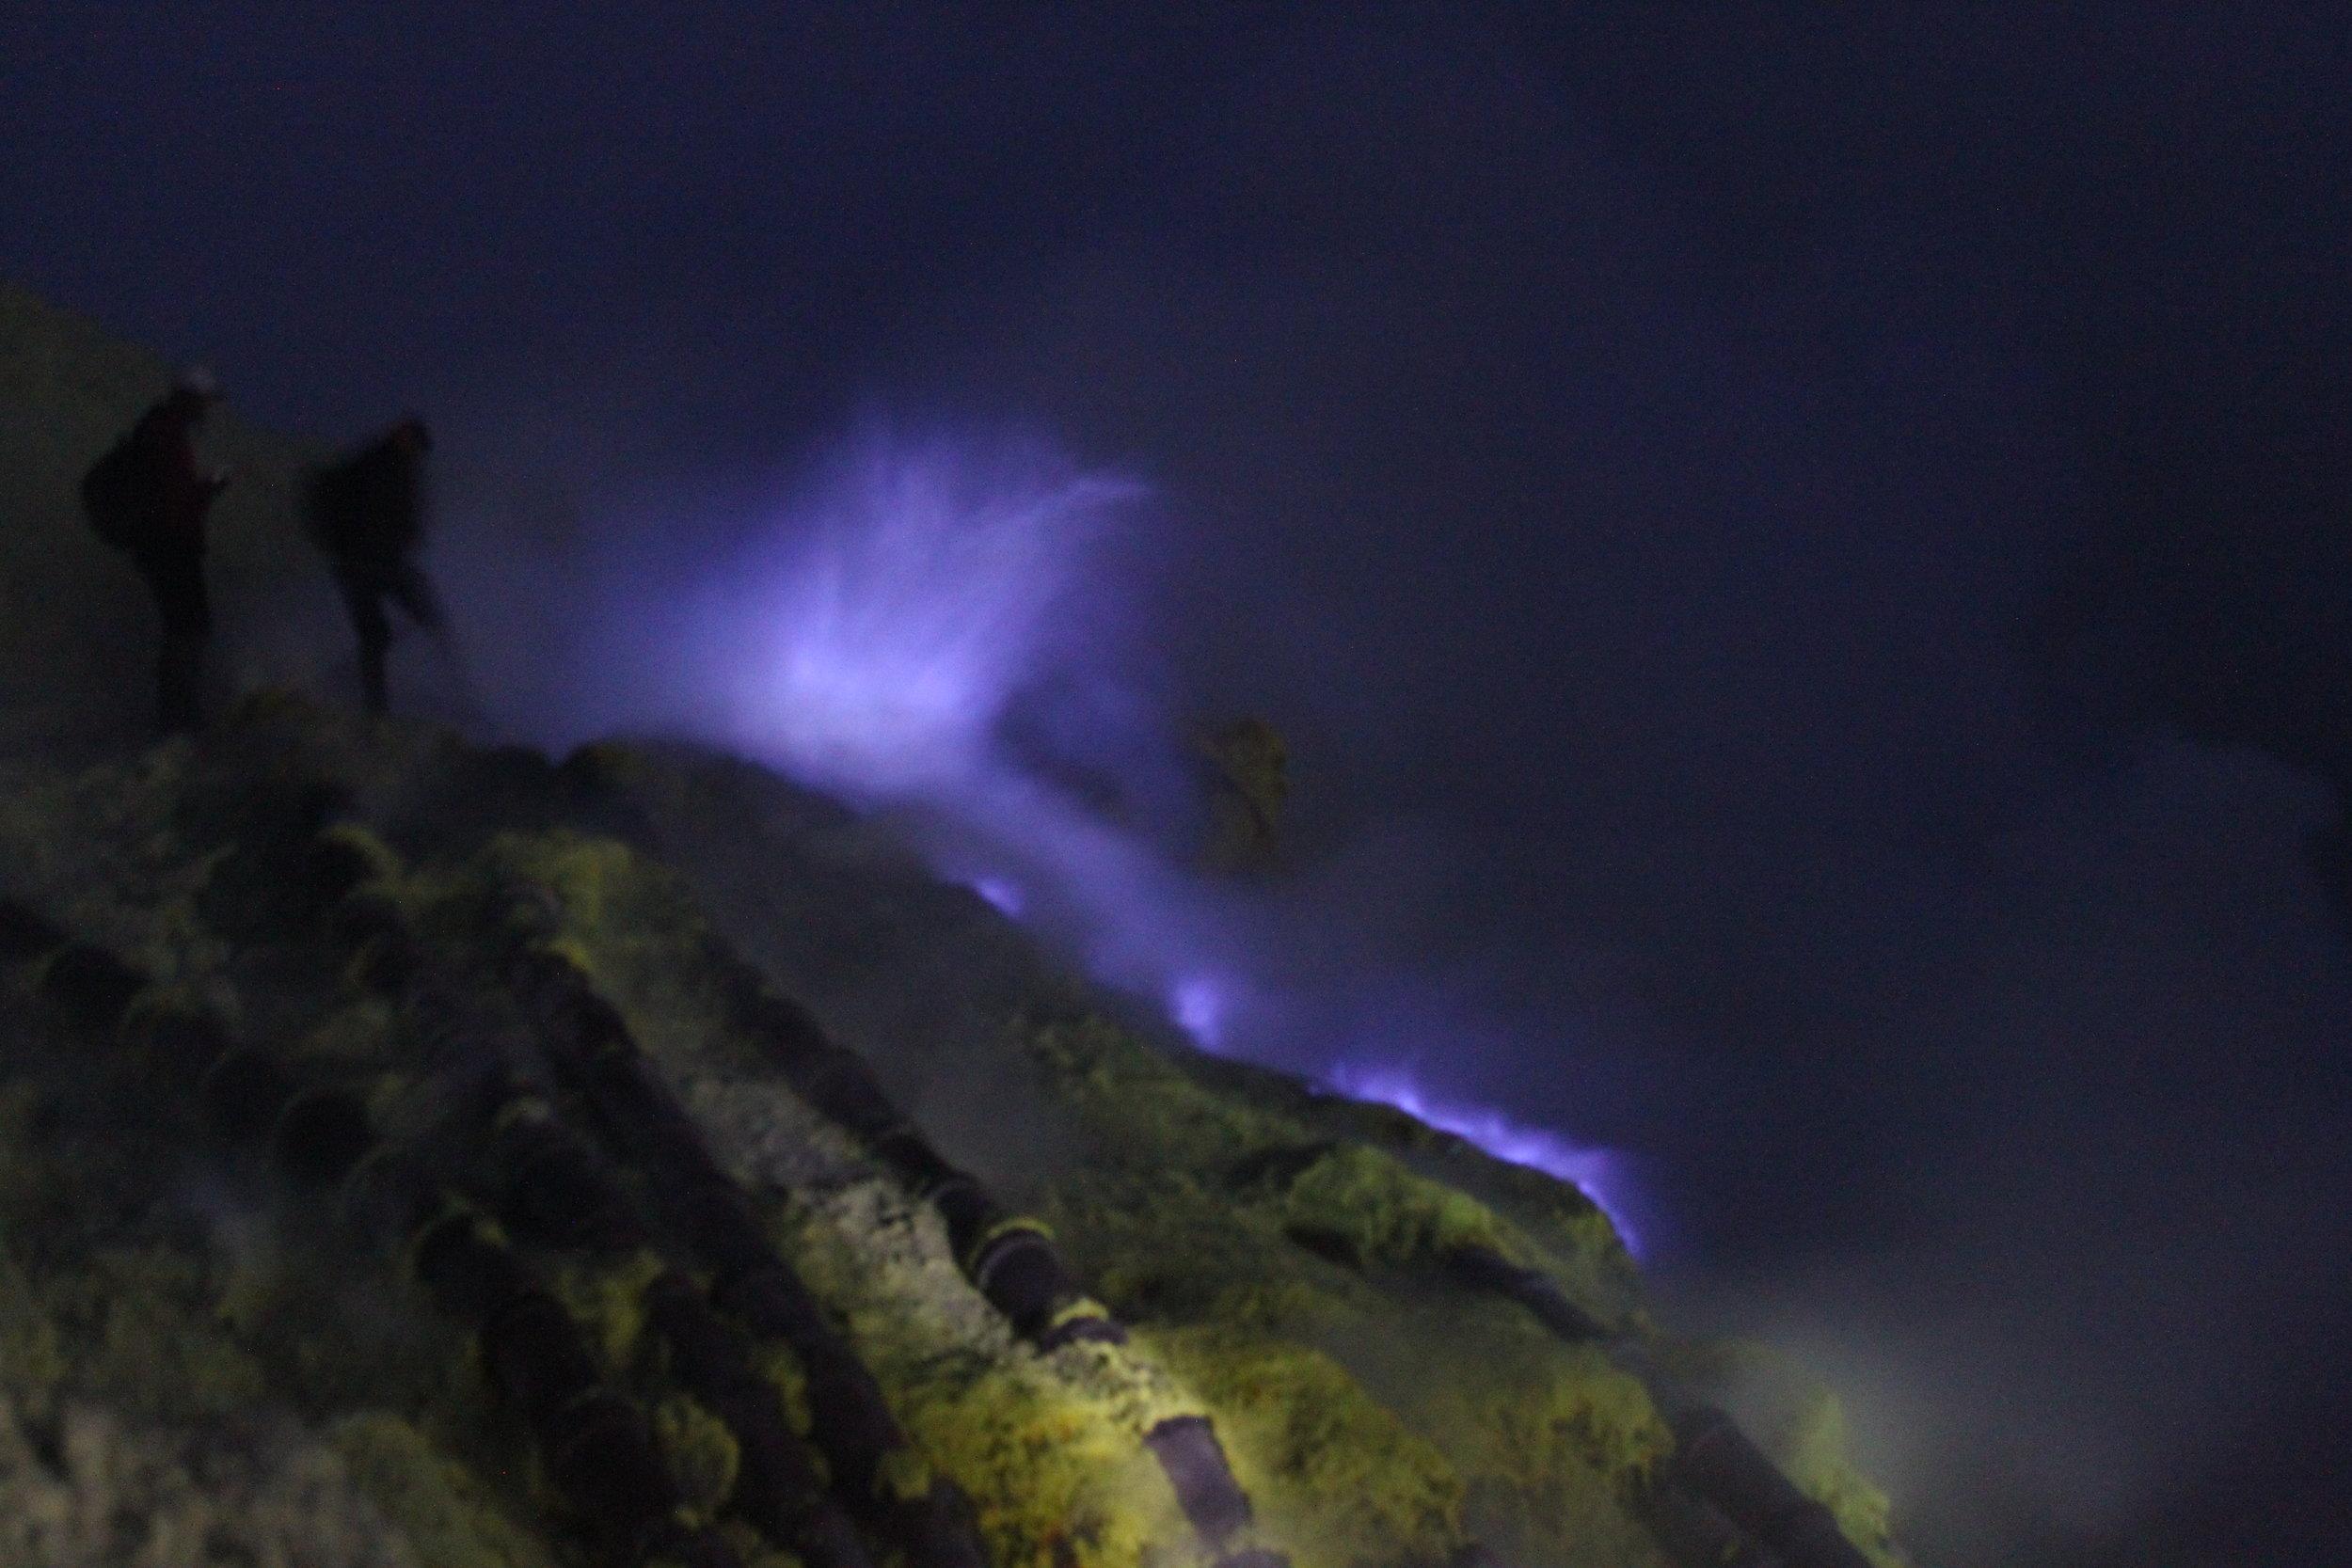 Blue Flames of Sulfuric Acid